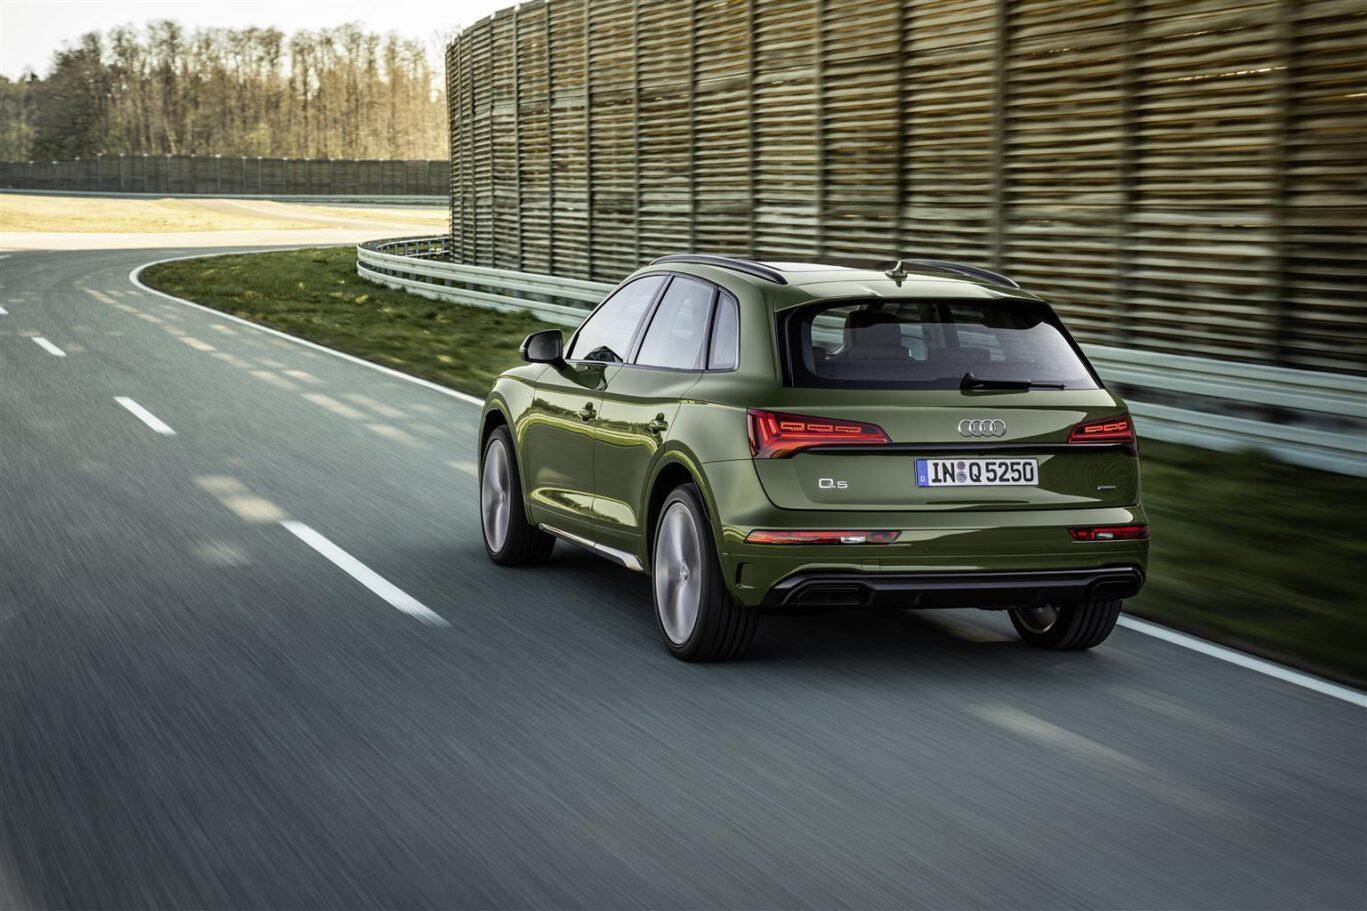 Nuova Audi Q5 posteriore